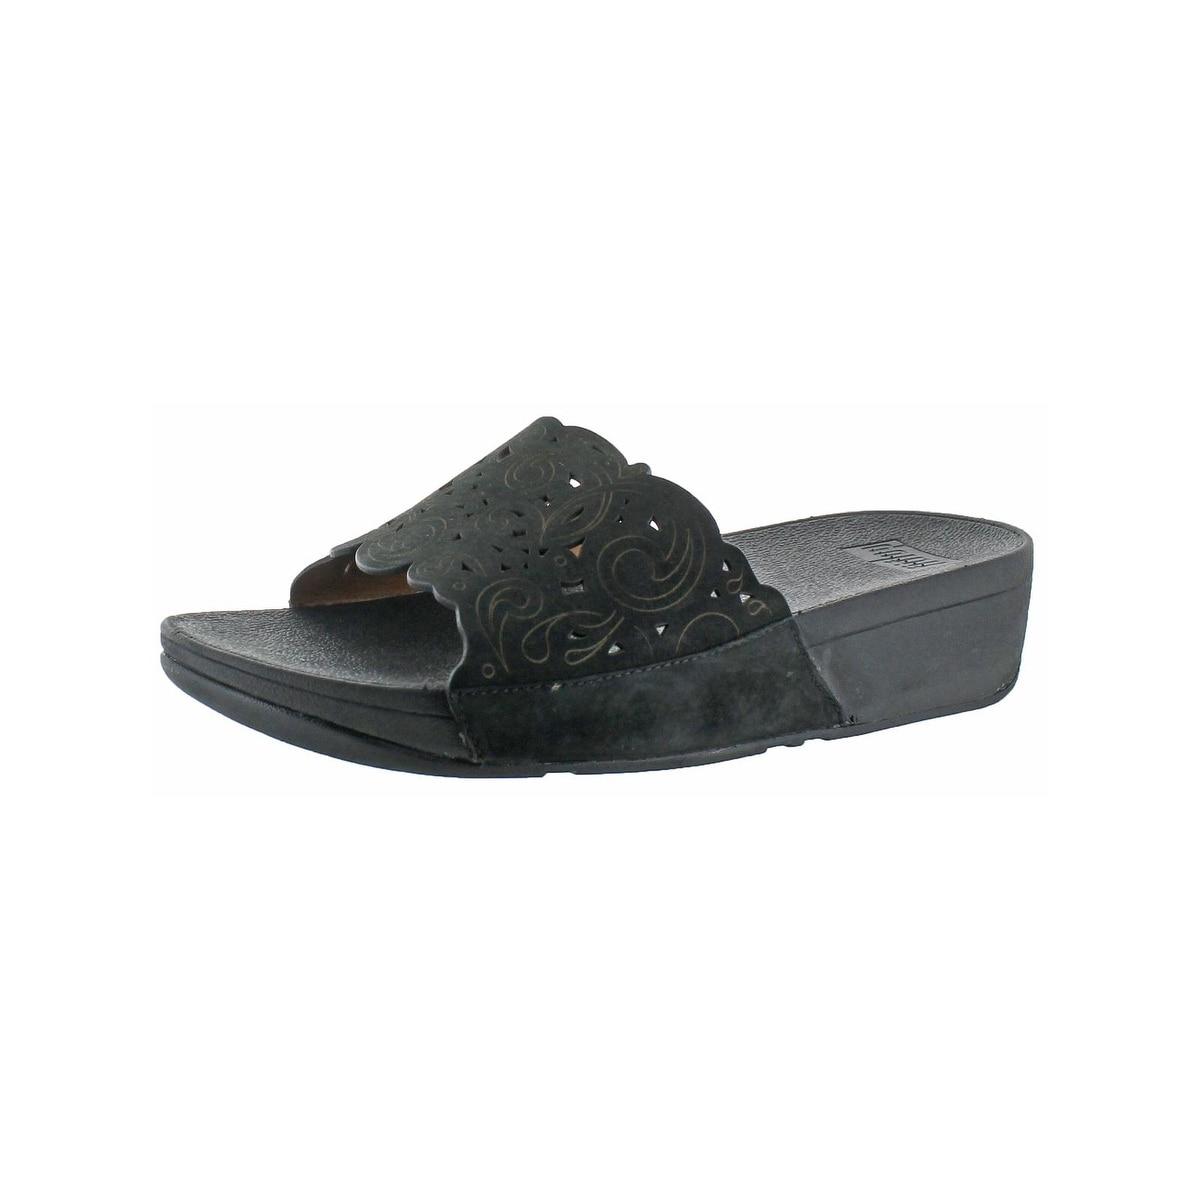 e441da46ee54b Fitflop Womens Flora Slide Sandals Leather Slip On